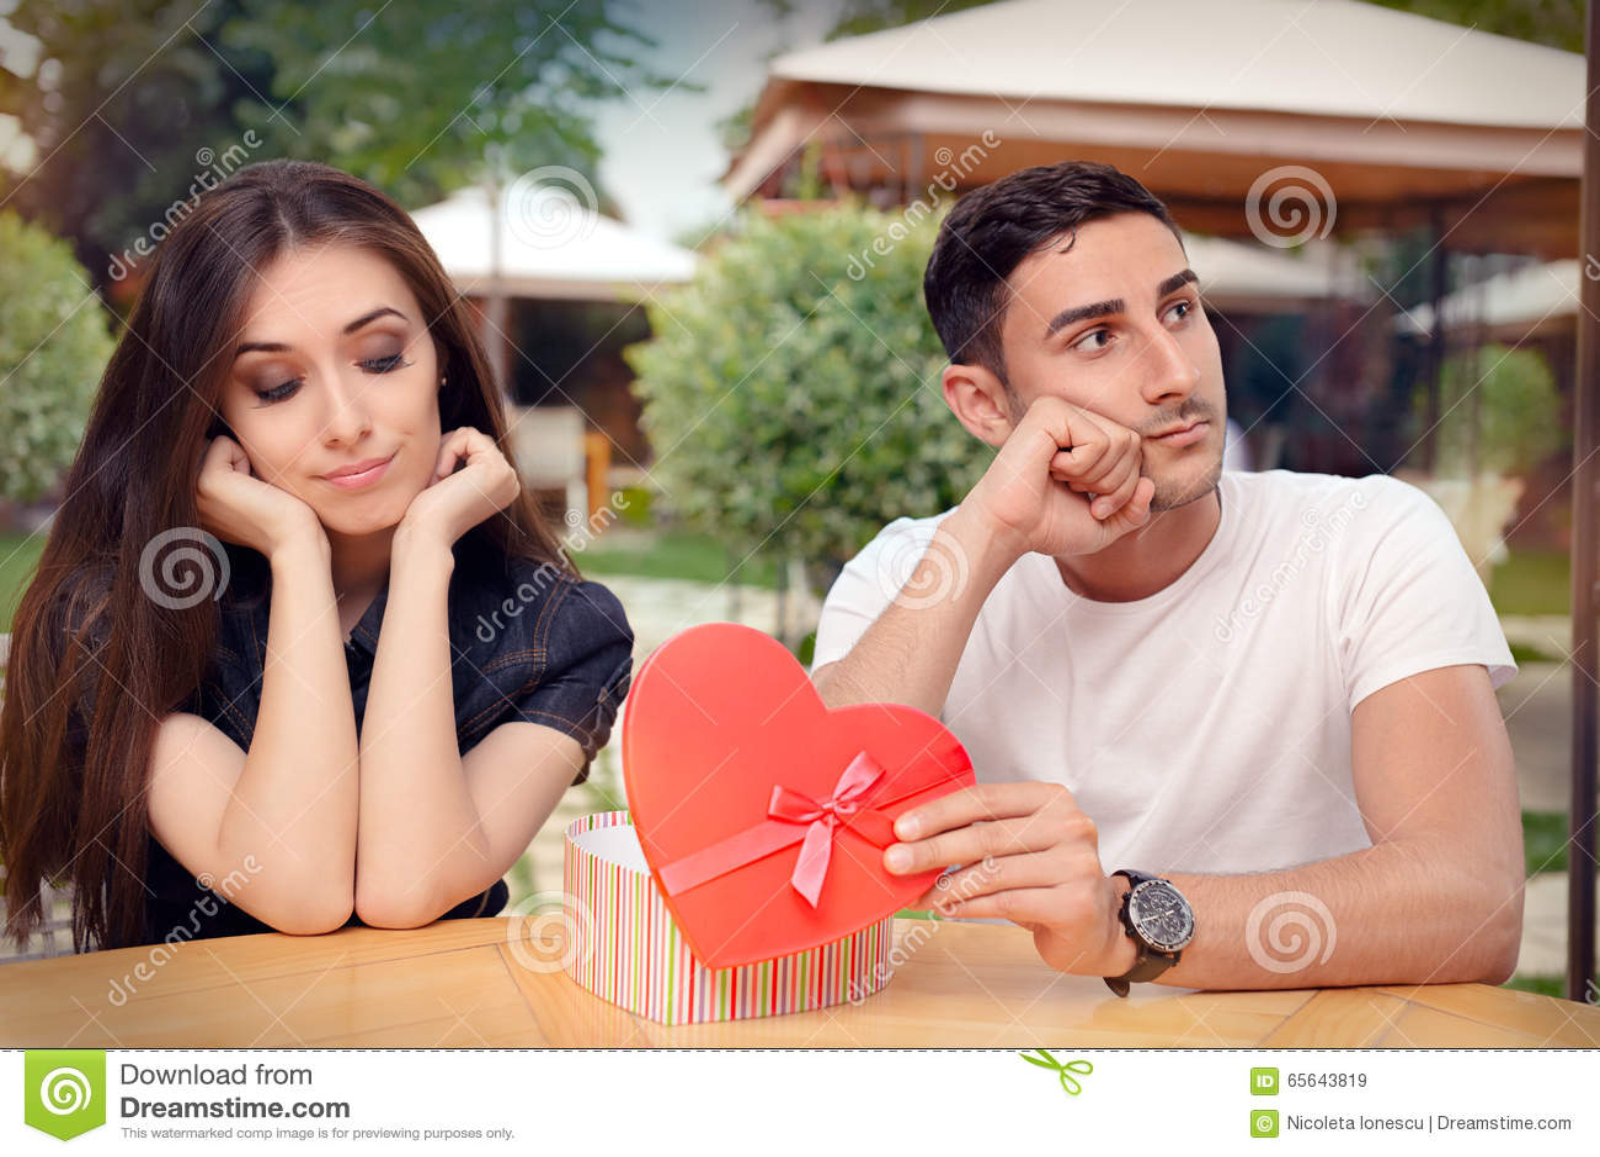 Flicka som svikas på hennes Valentine Gift From Boyfriend